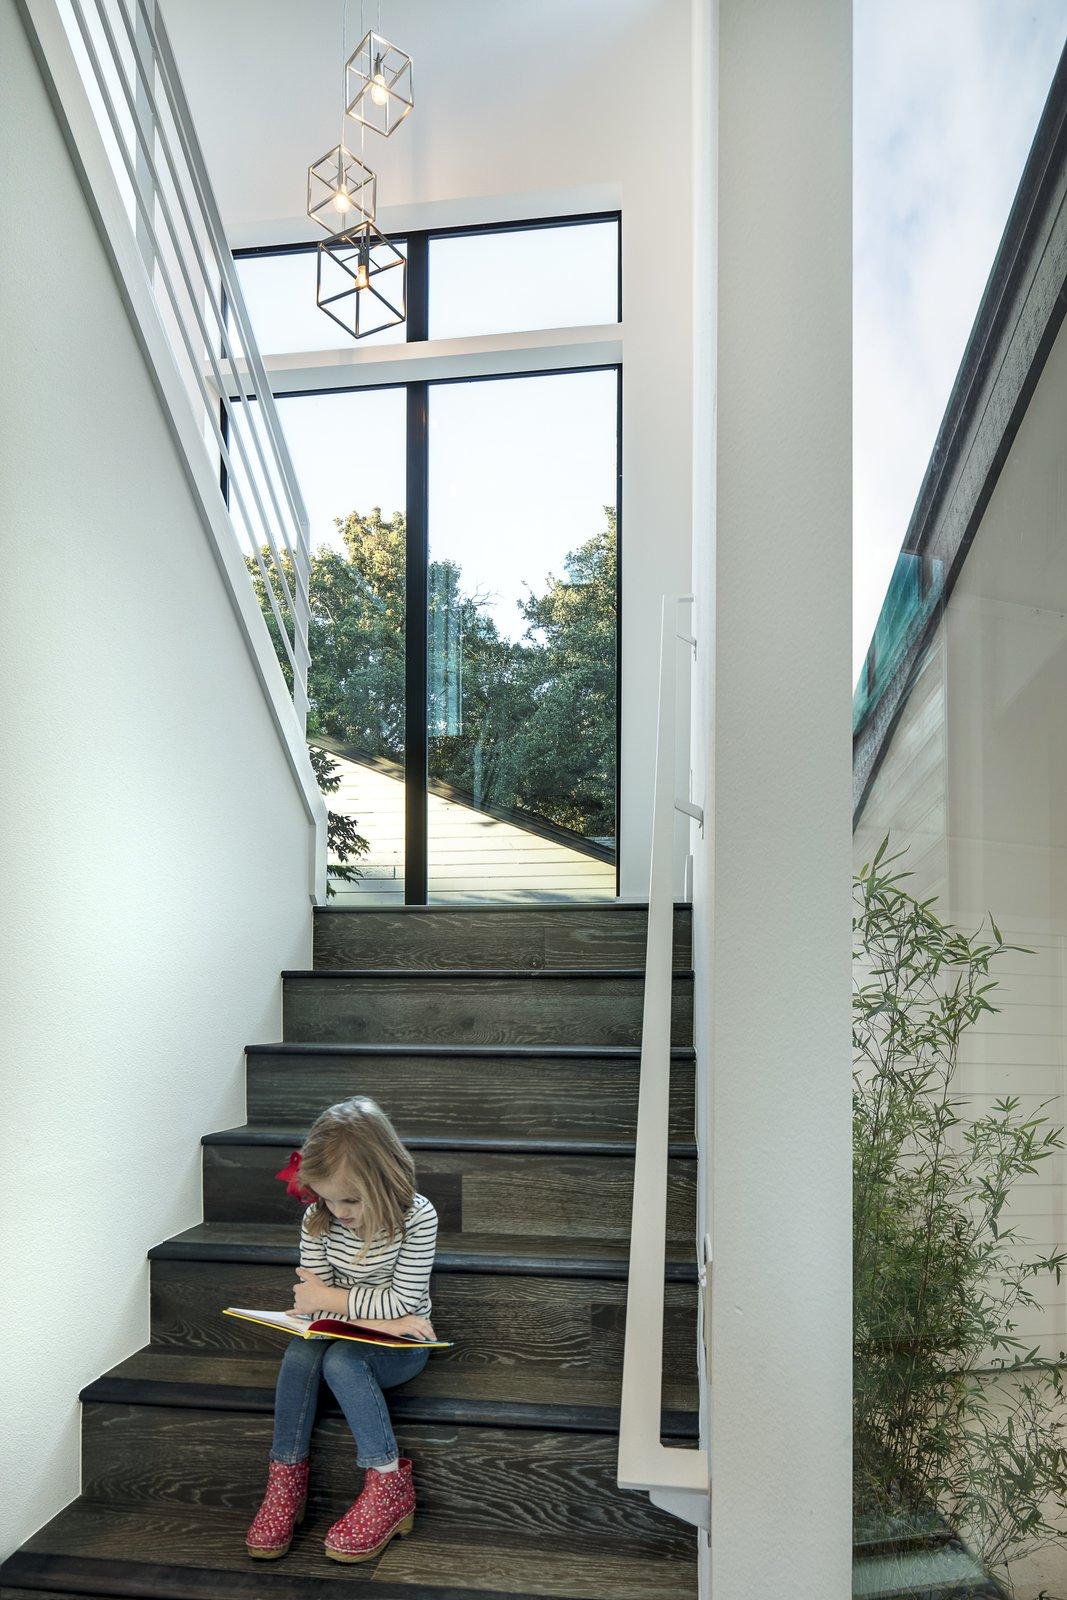 Strass Residence by Matt Fajkus Architecture   Photography: Atelier Wong Photography  Strass Residence